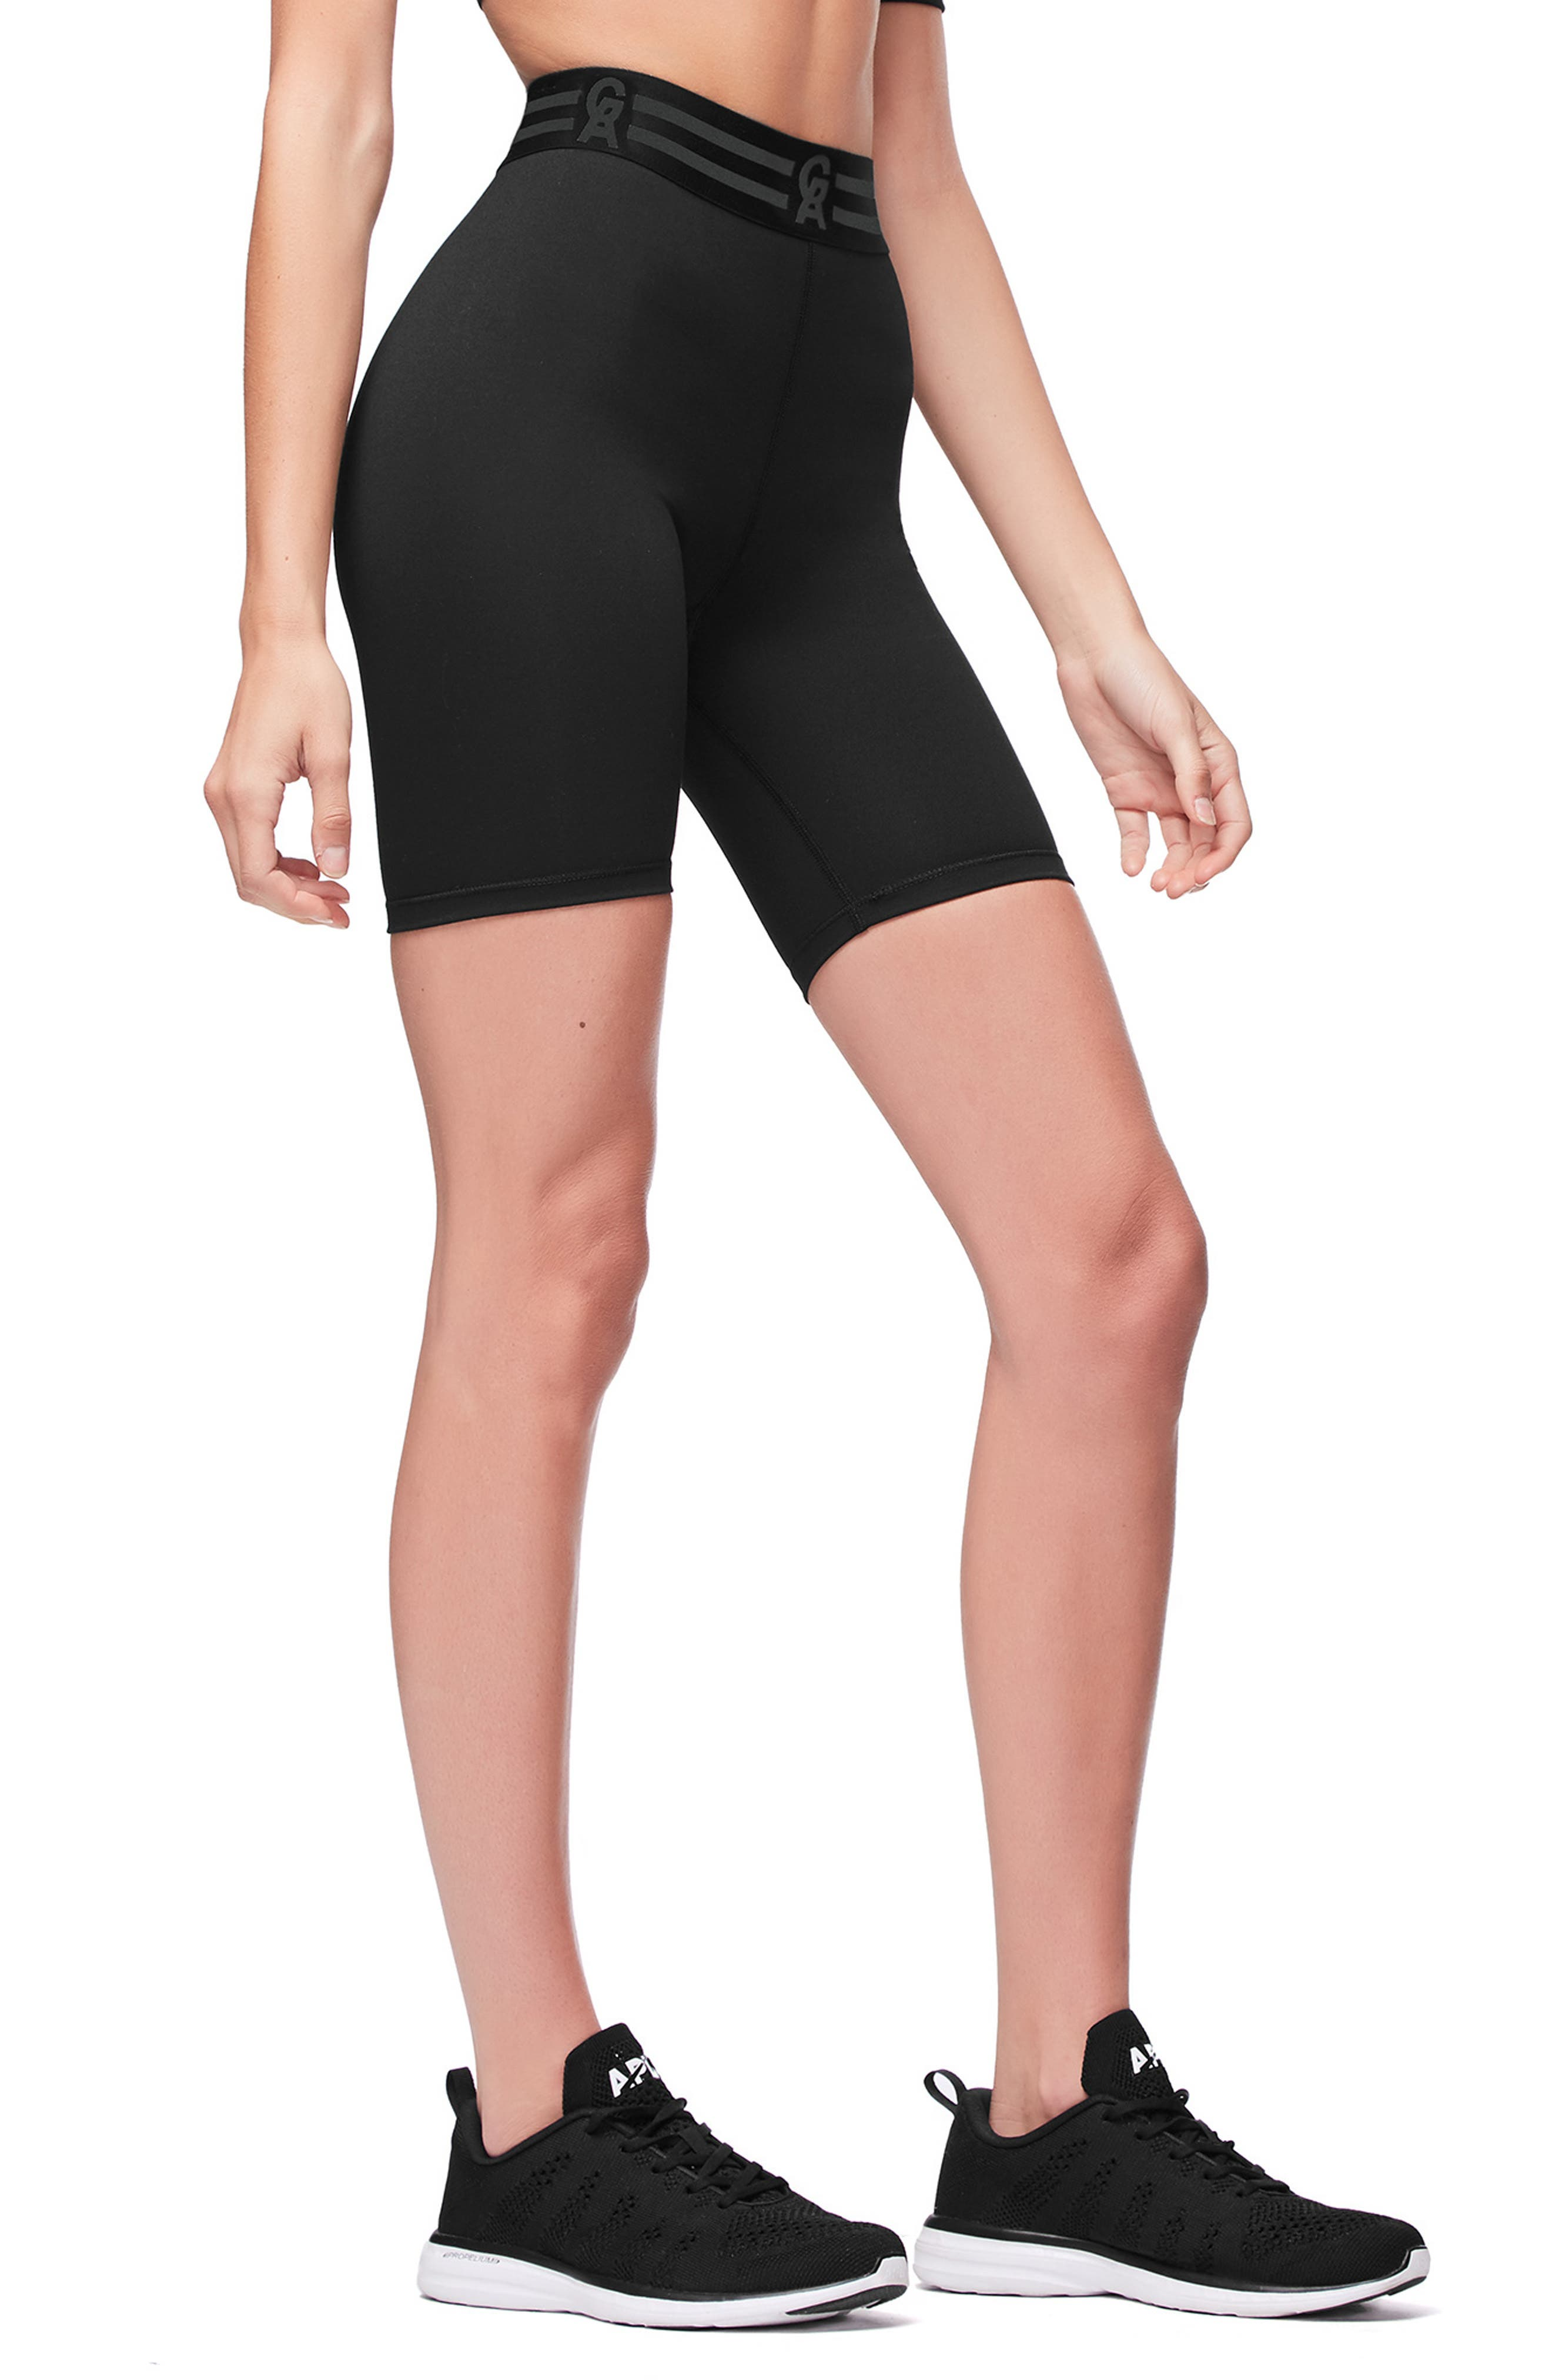 Icon High Waist Biker Shorts,                             Alternate thumbnail 4, color,                             BLACK001